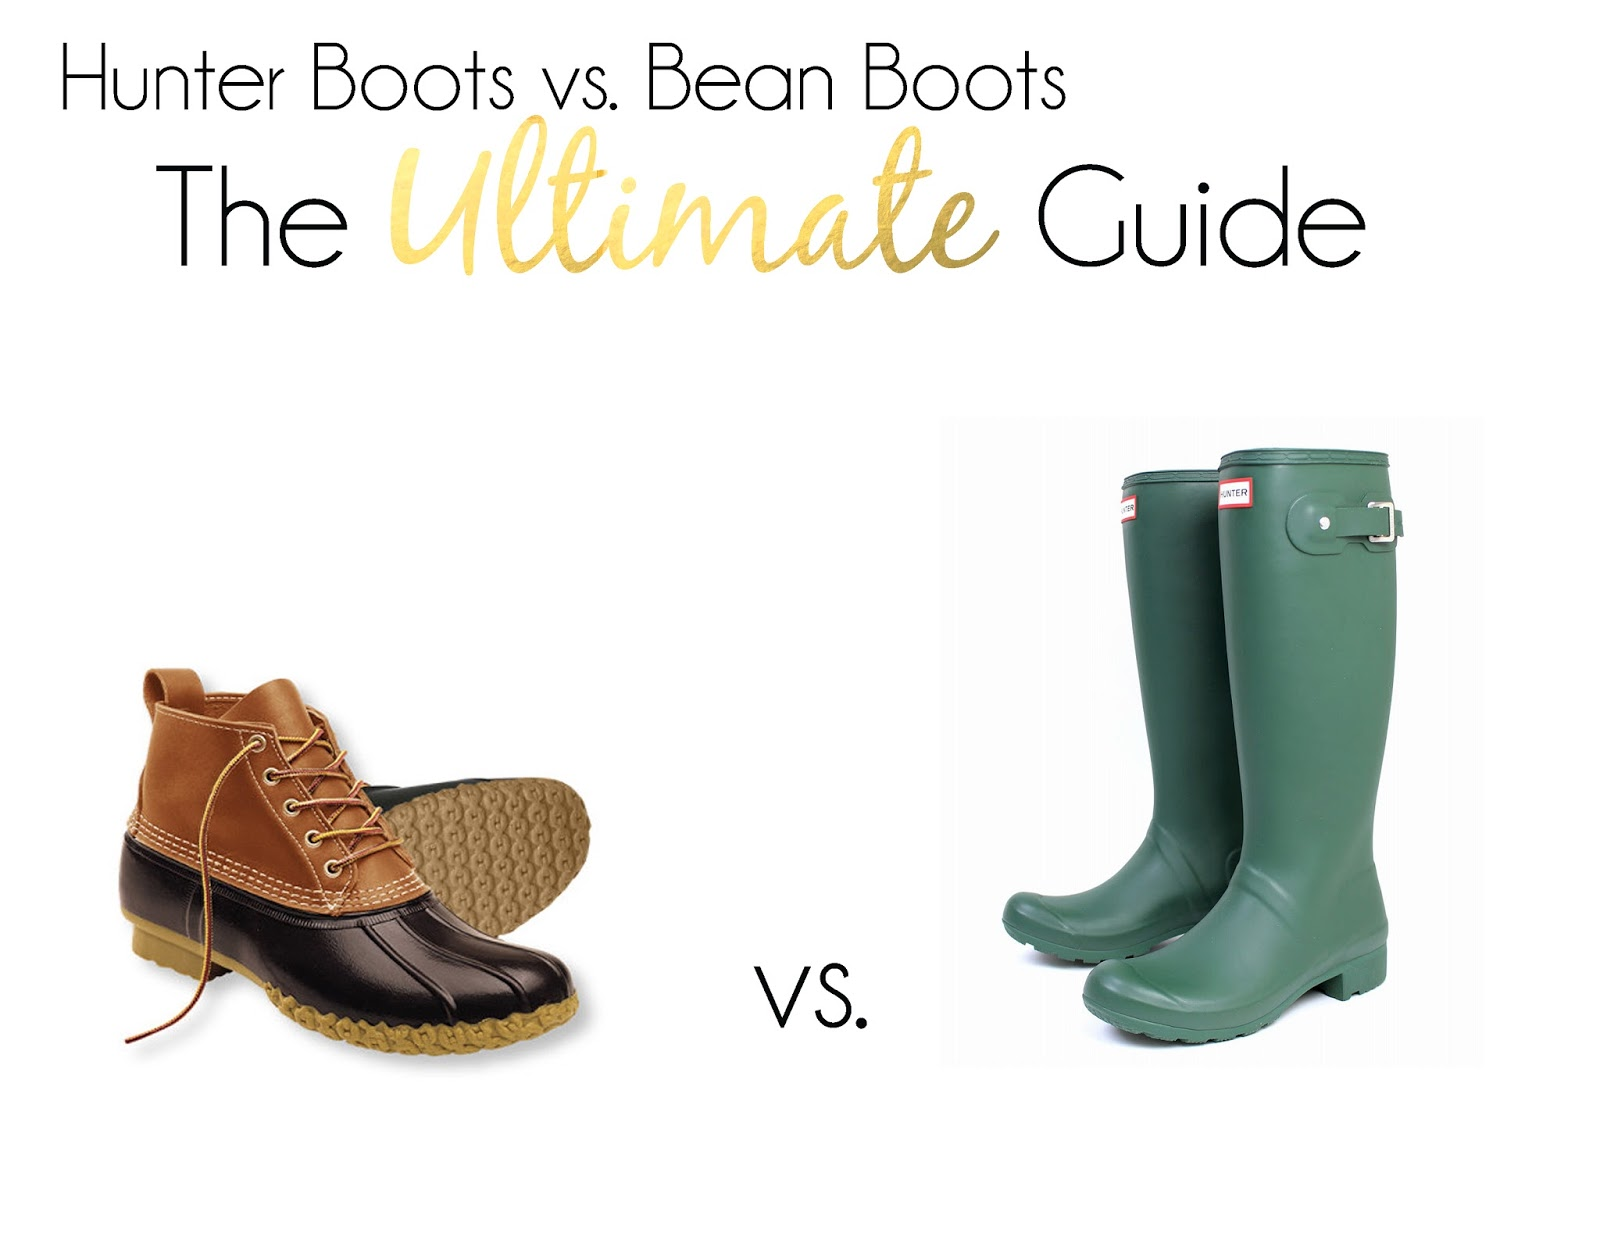 36b138094b2 L.L. Bean Boots vs. Hunter Boots  The Ultimate Guide - PrepEssentials